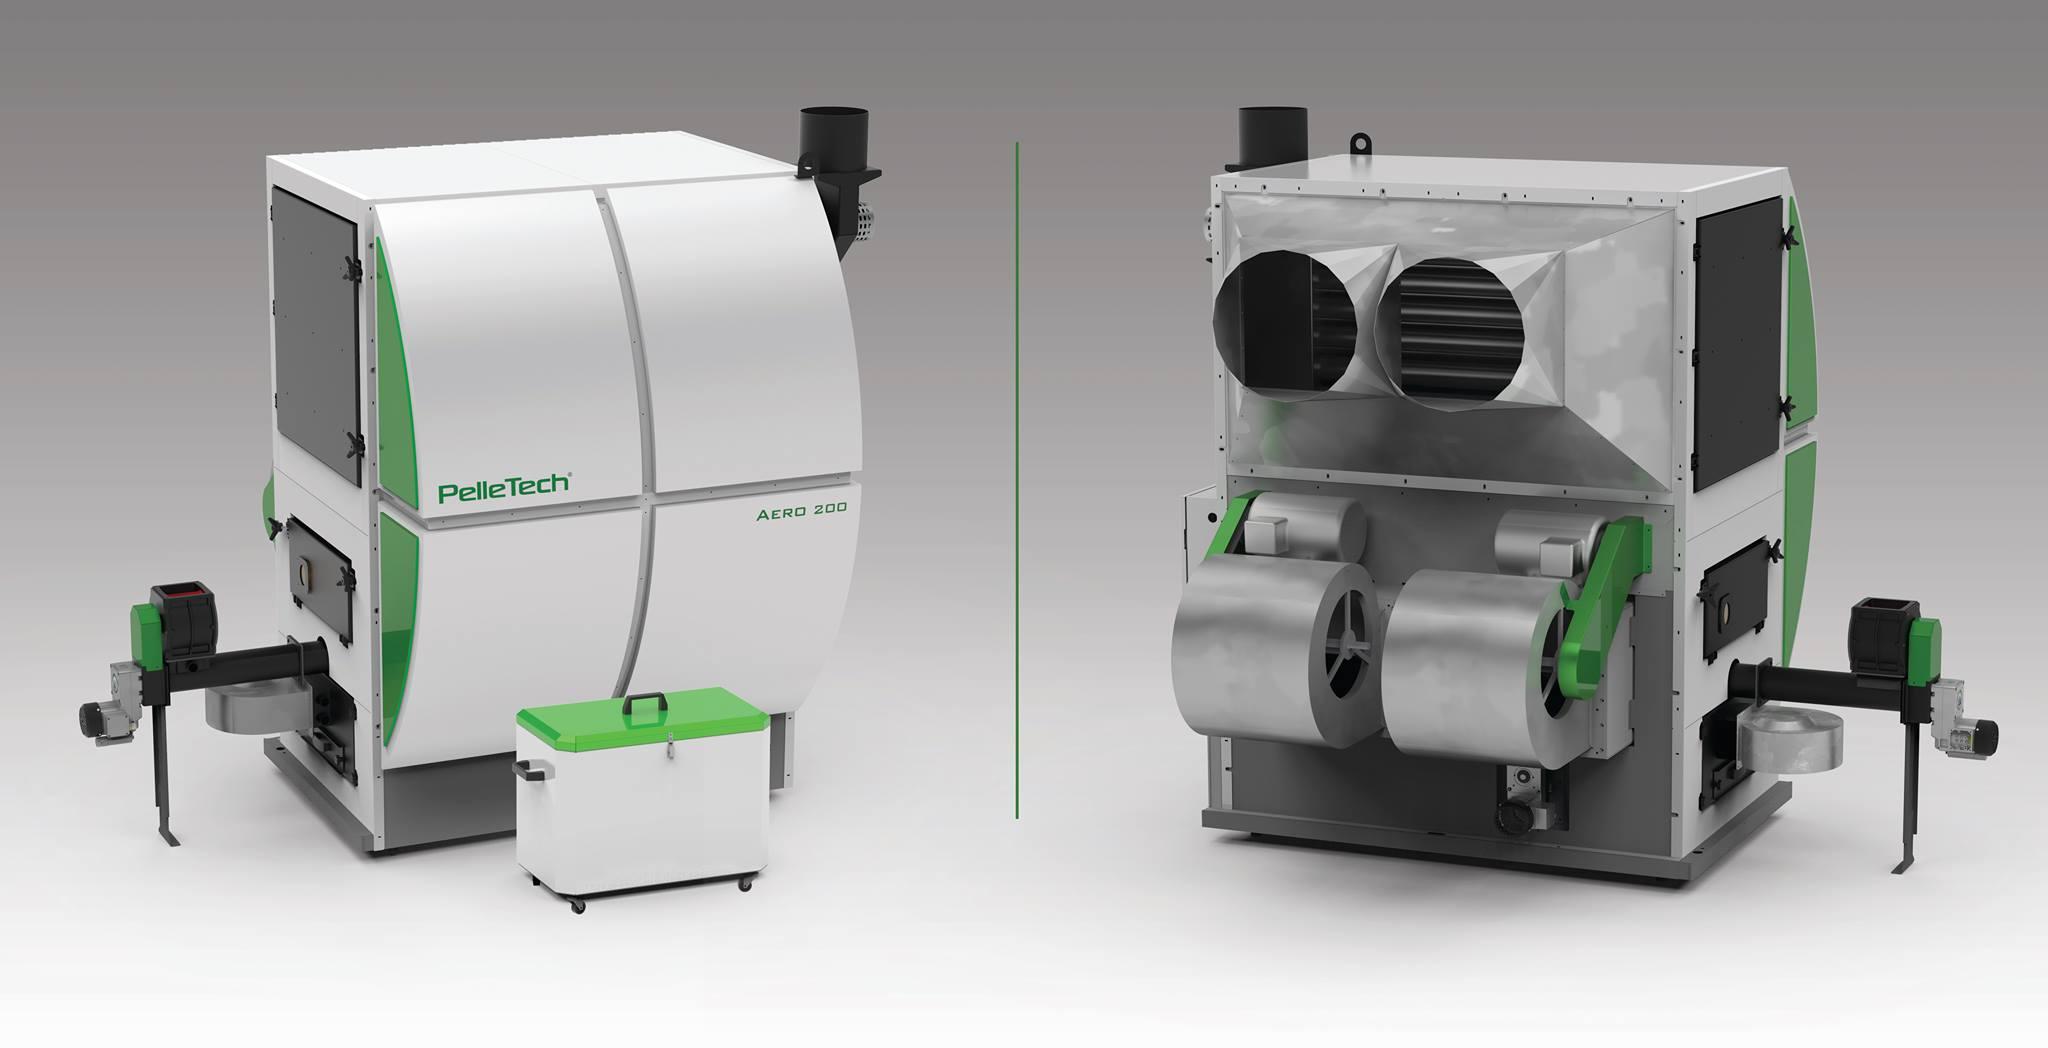 Воздушные теплогенераторы PelleTech AERO-150/200/350/500 - ЭкоЭнергоПроект